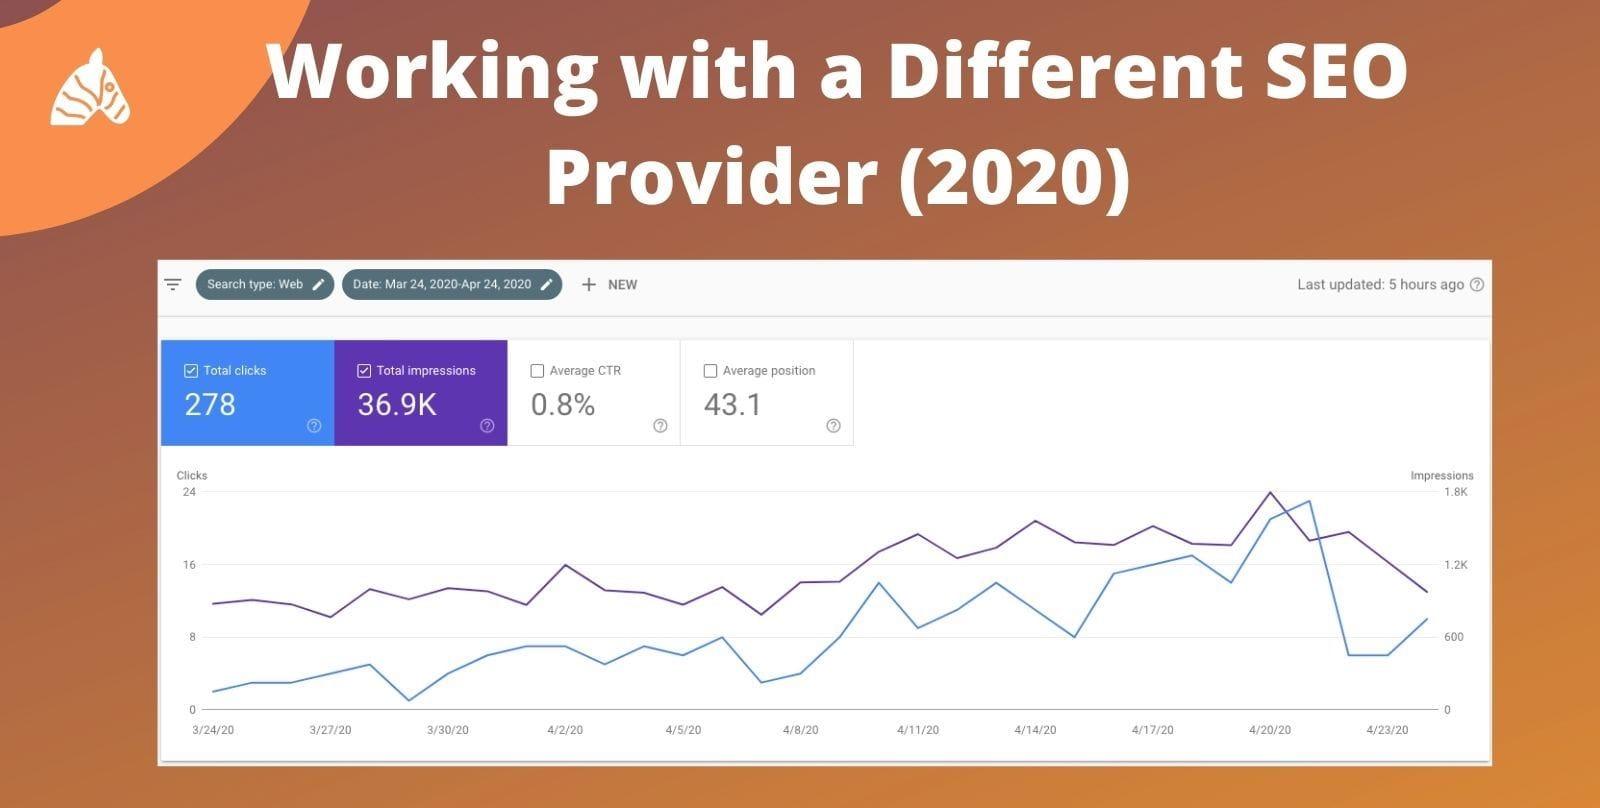 Previous SEO services provider results